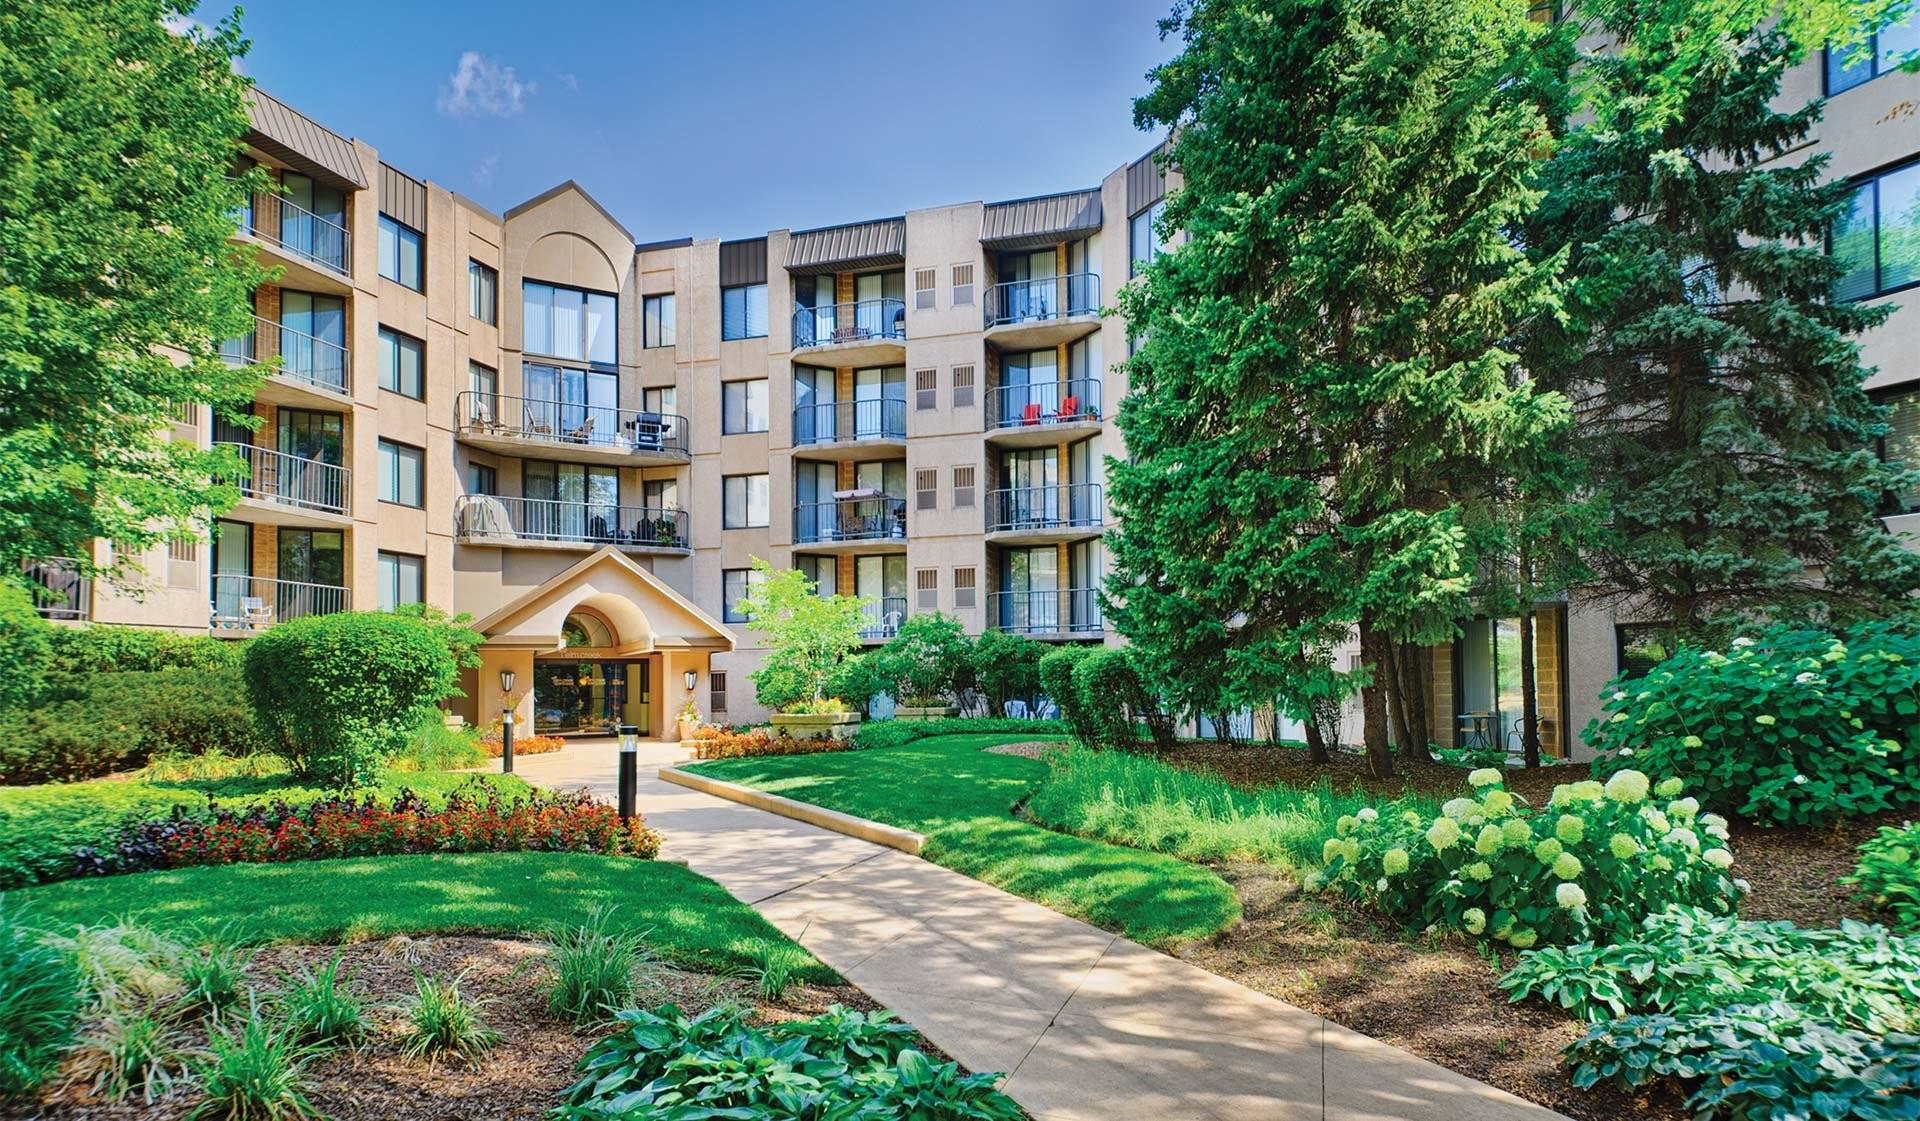 Elm Creek Apartments & Townhomes